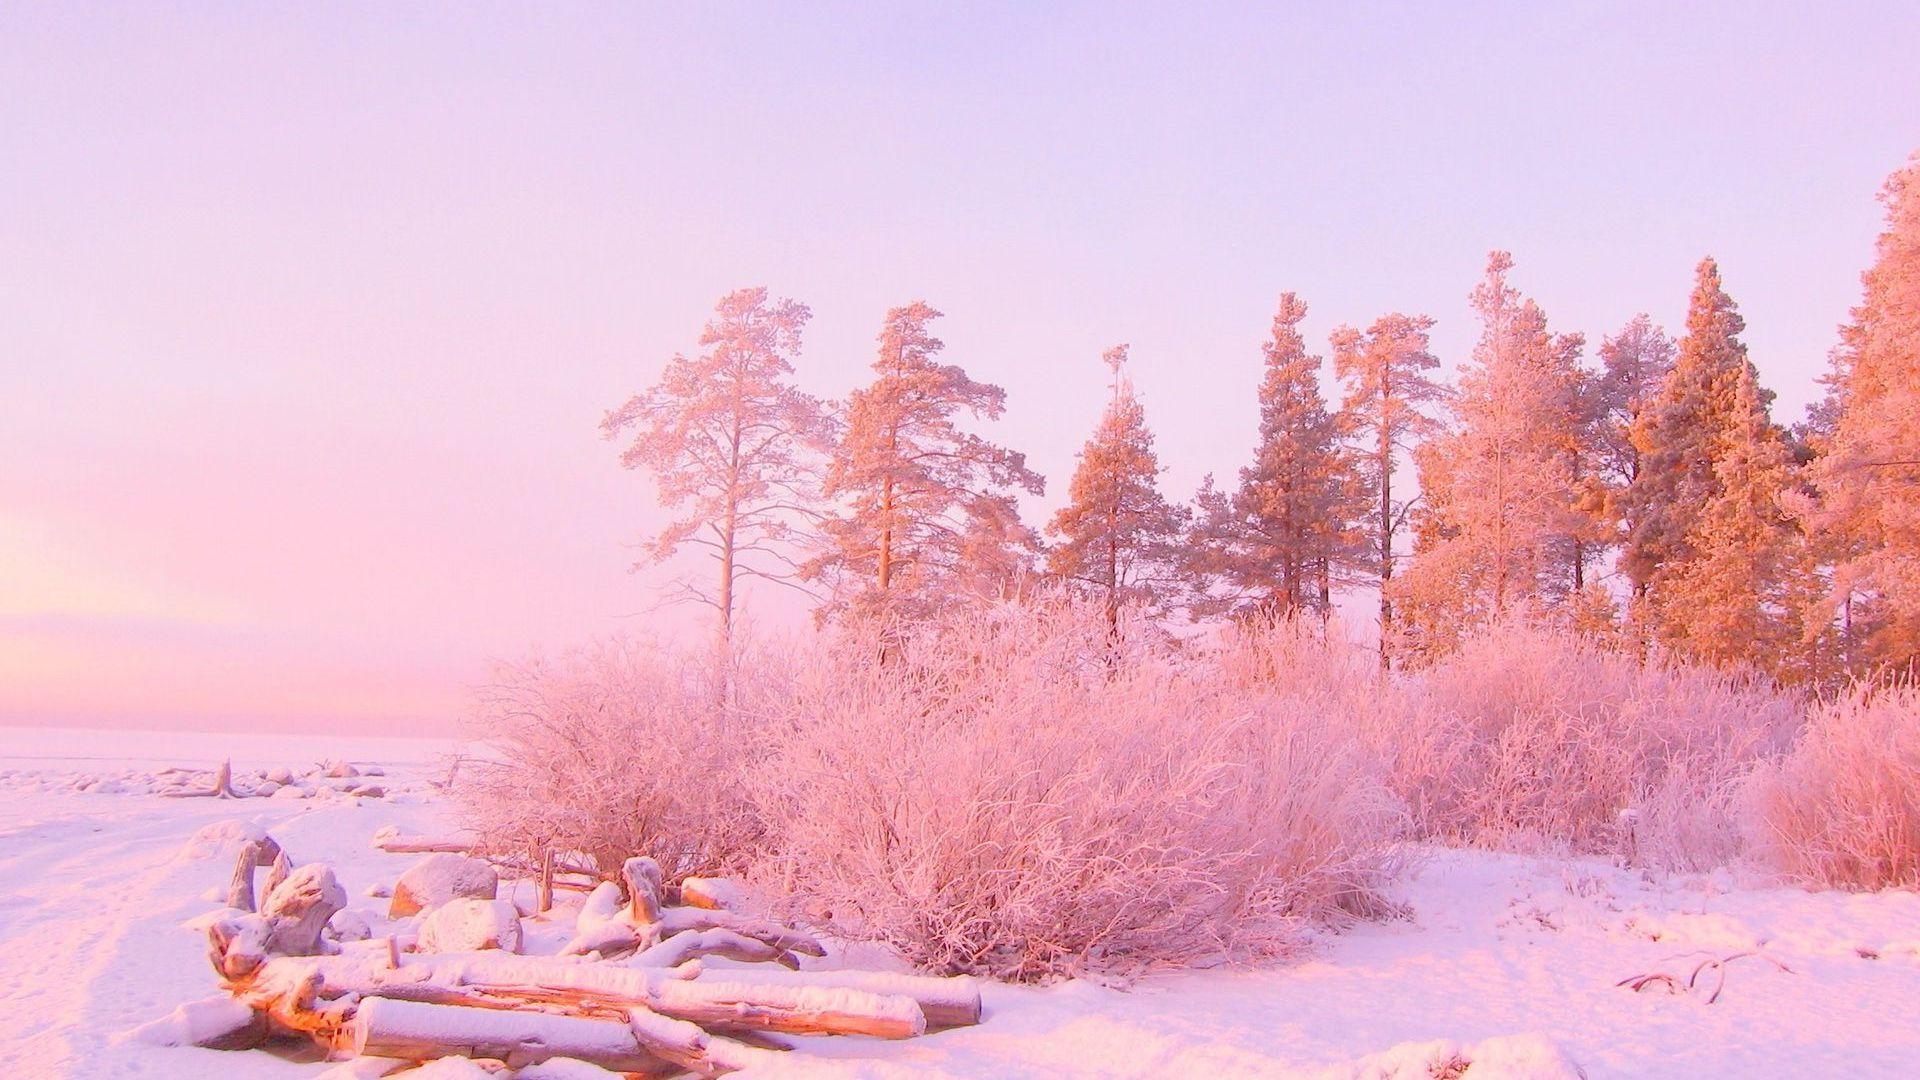 Landscape Wallpaper Pink Wallpaper Backgrounds Pink Wallpaper Desktop